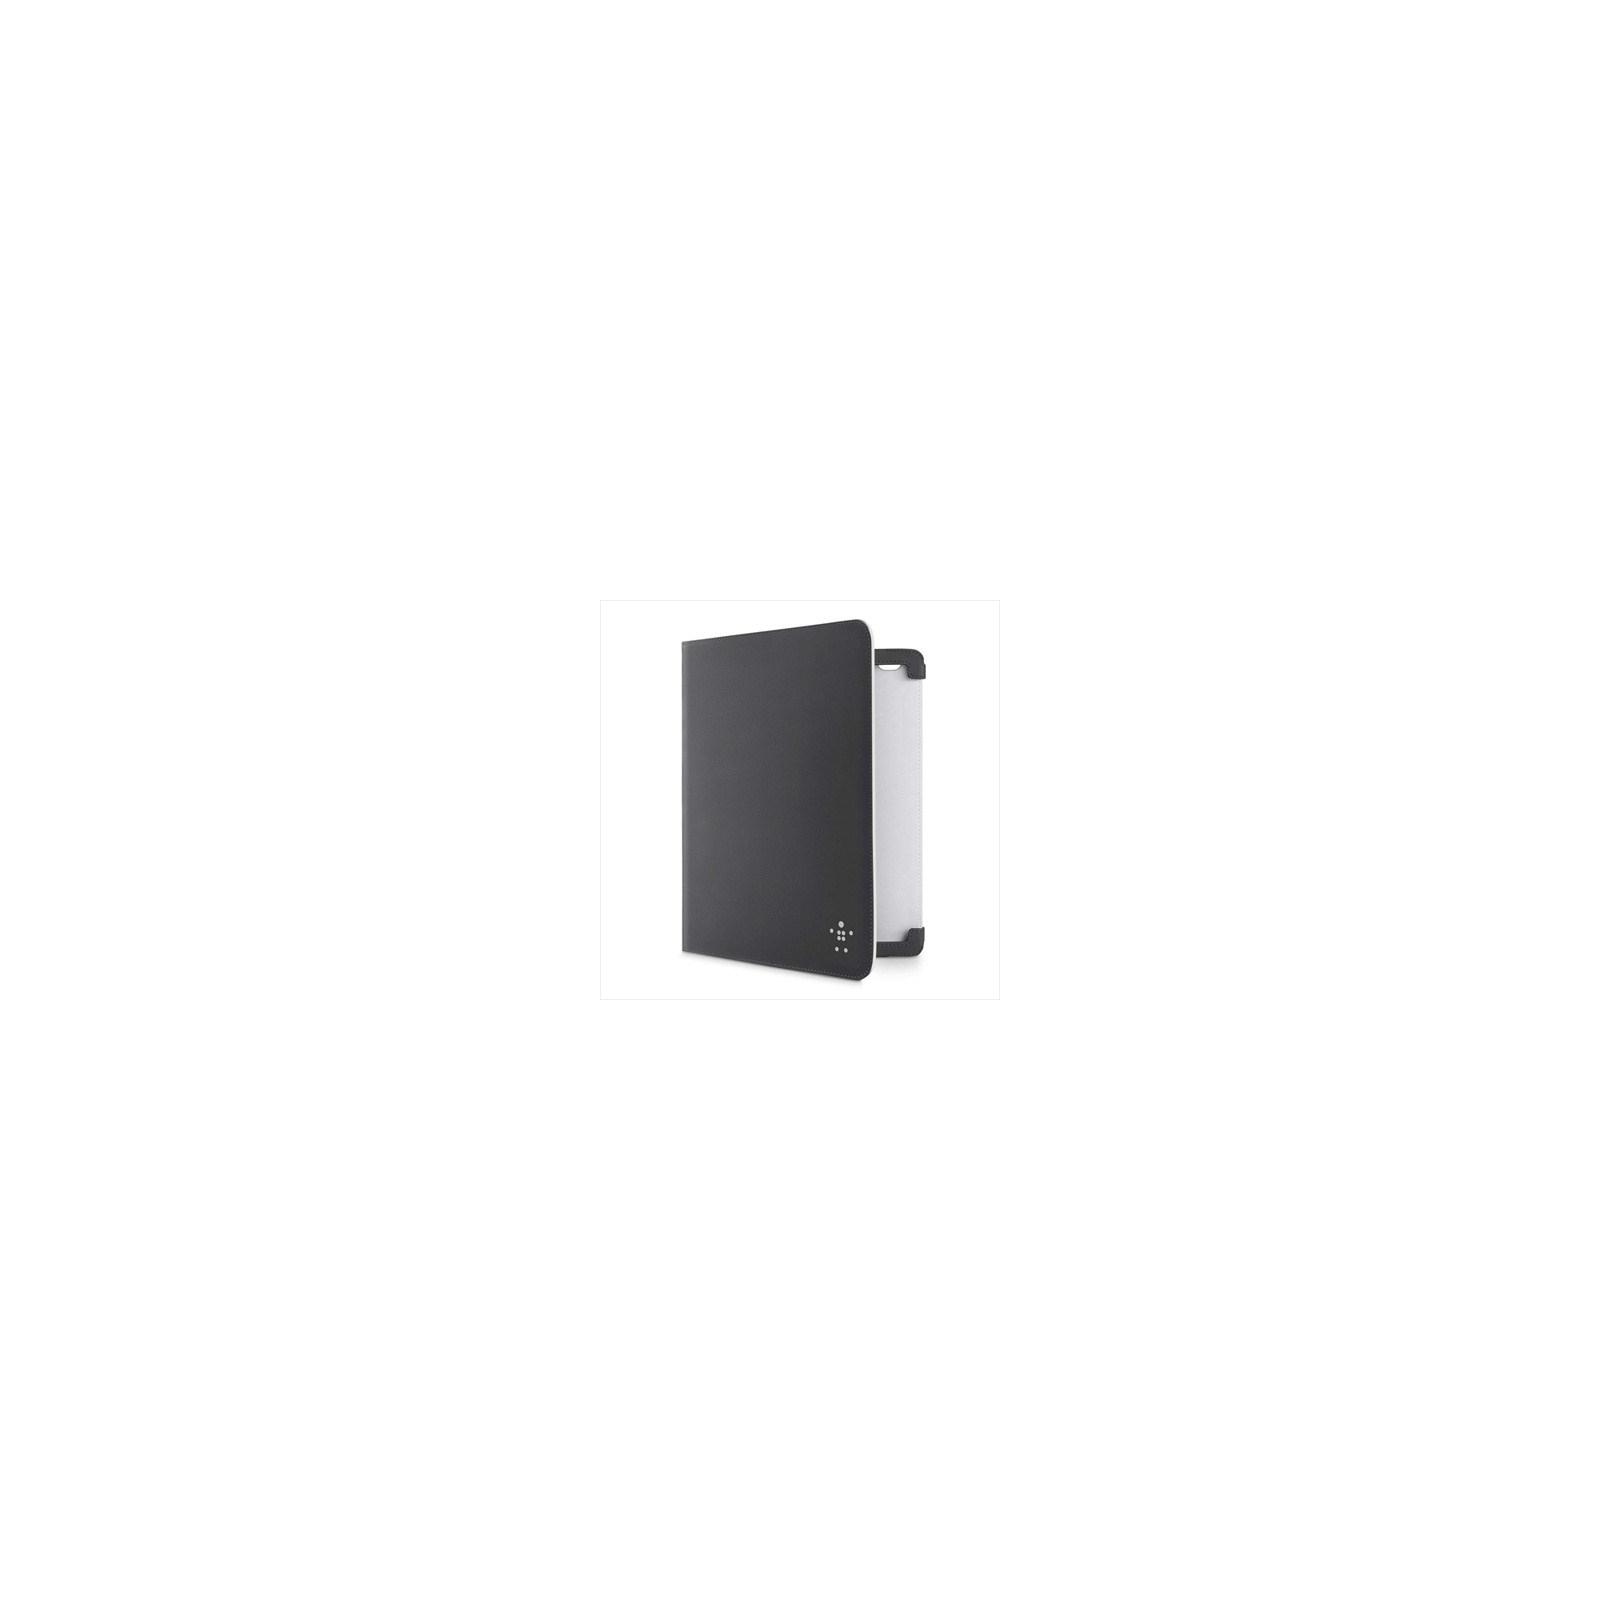 Чехол для планшета Belkin Folio Bi-fold folio (Black) (F8N771cwC00)